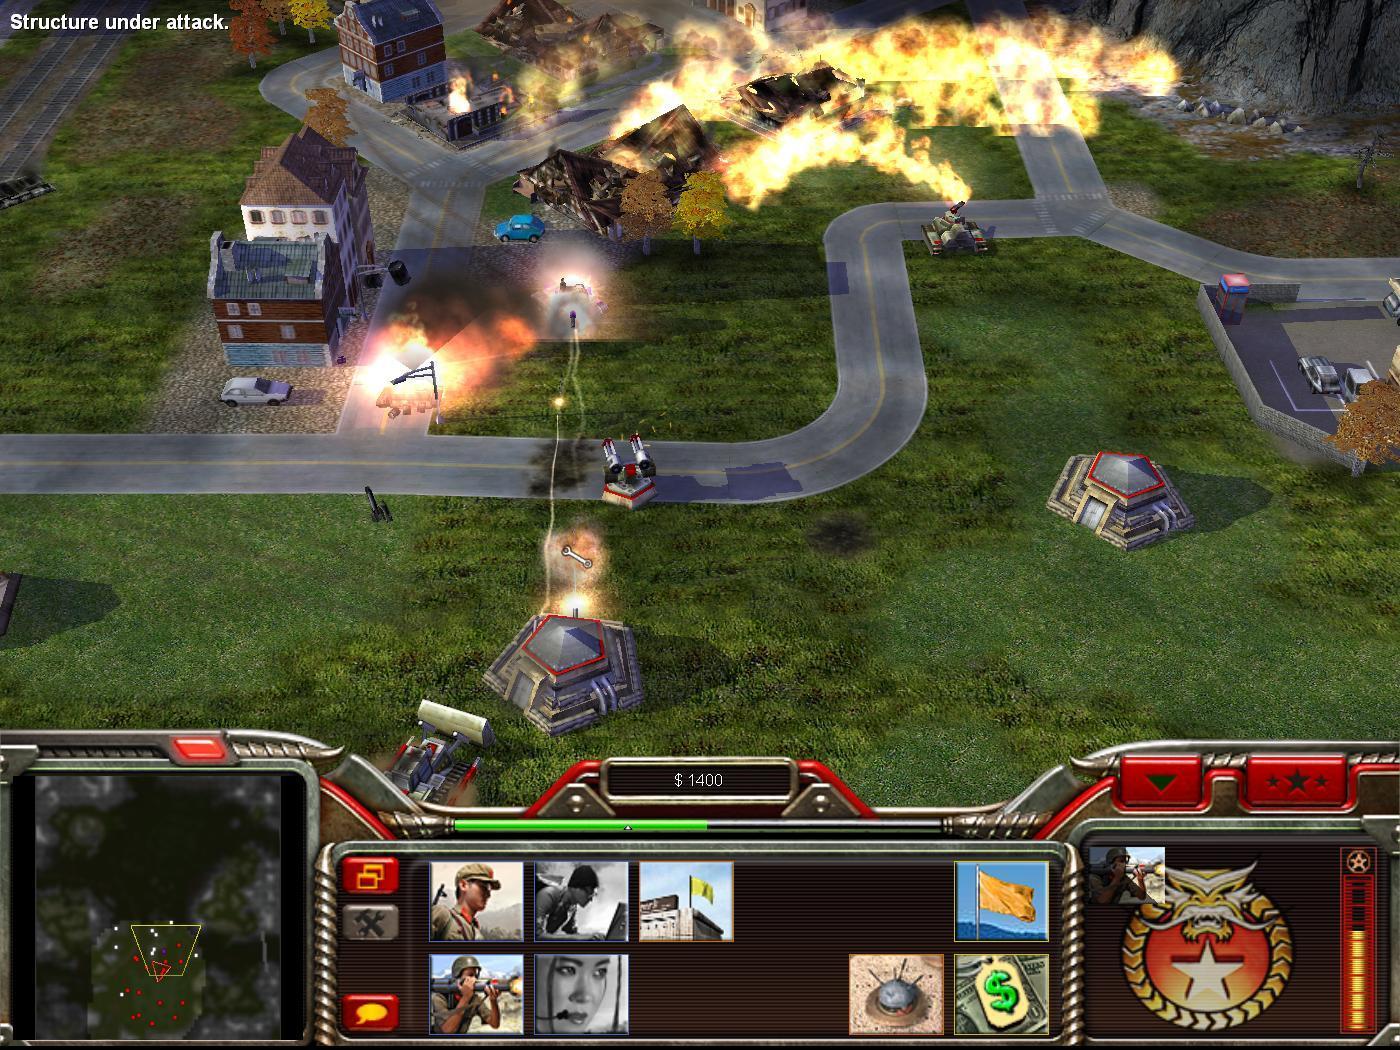 Combat Graphic View